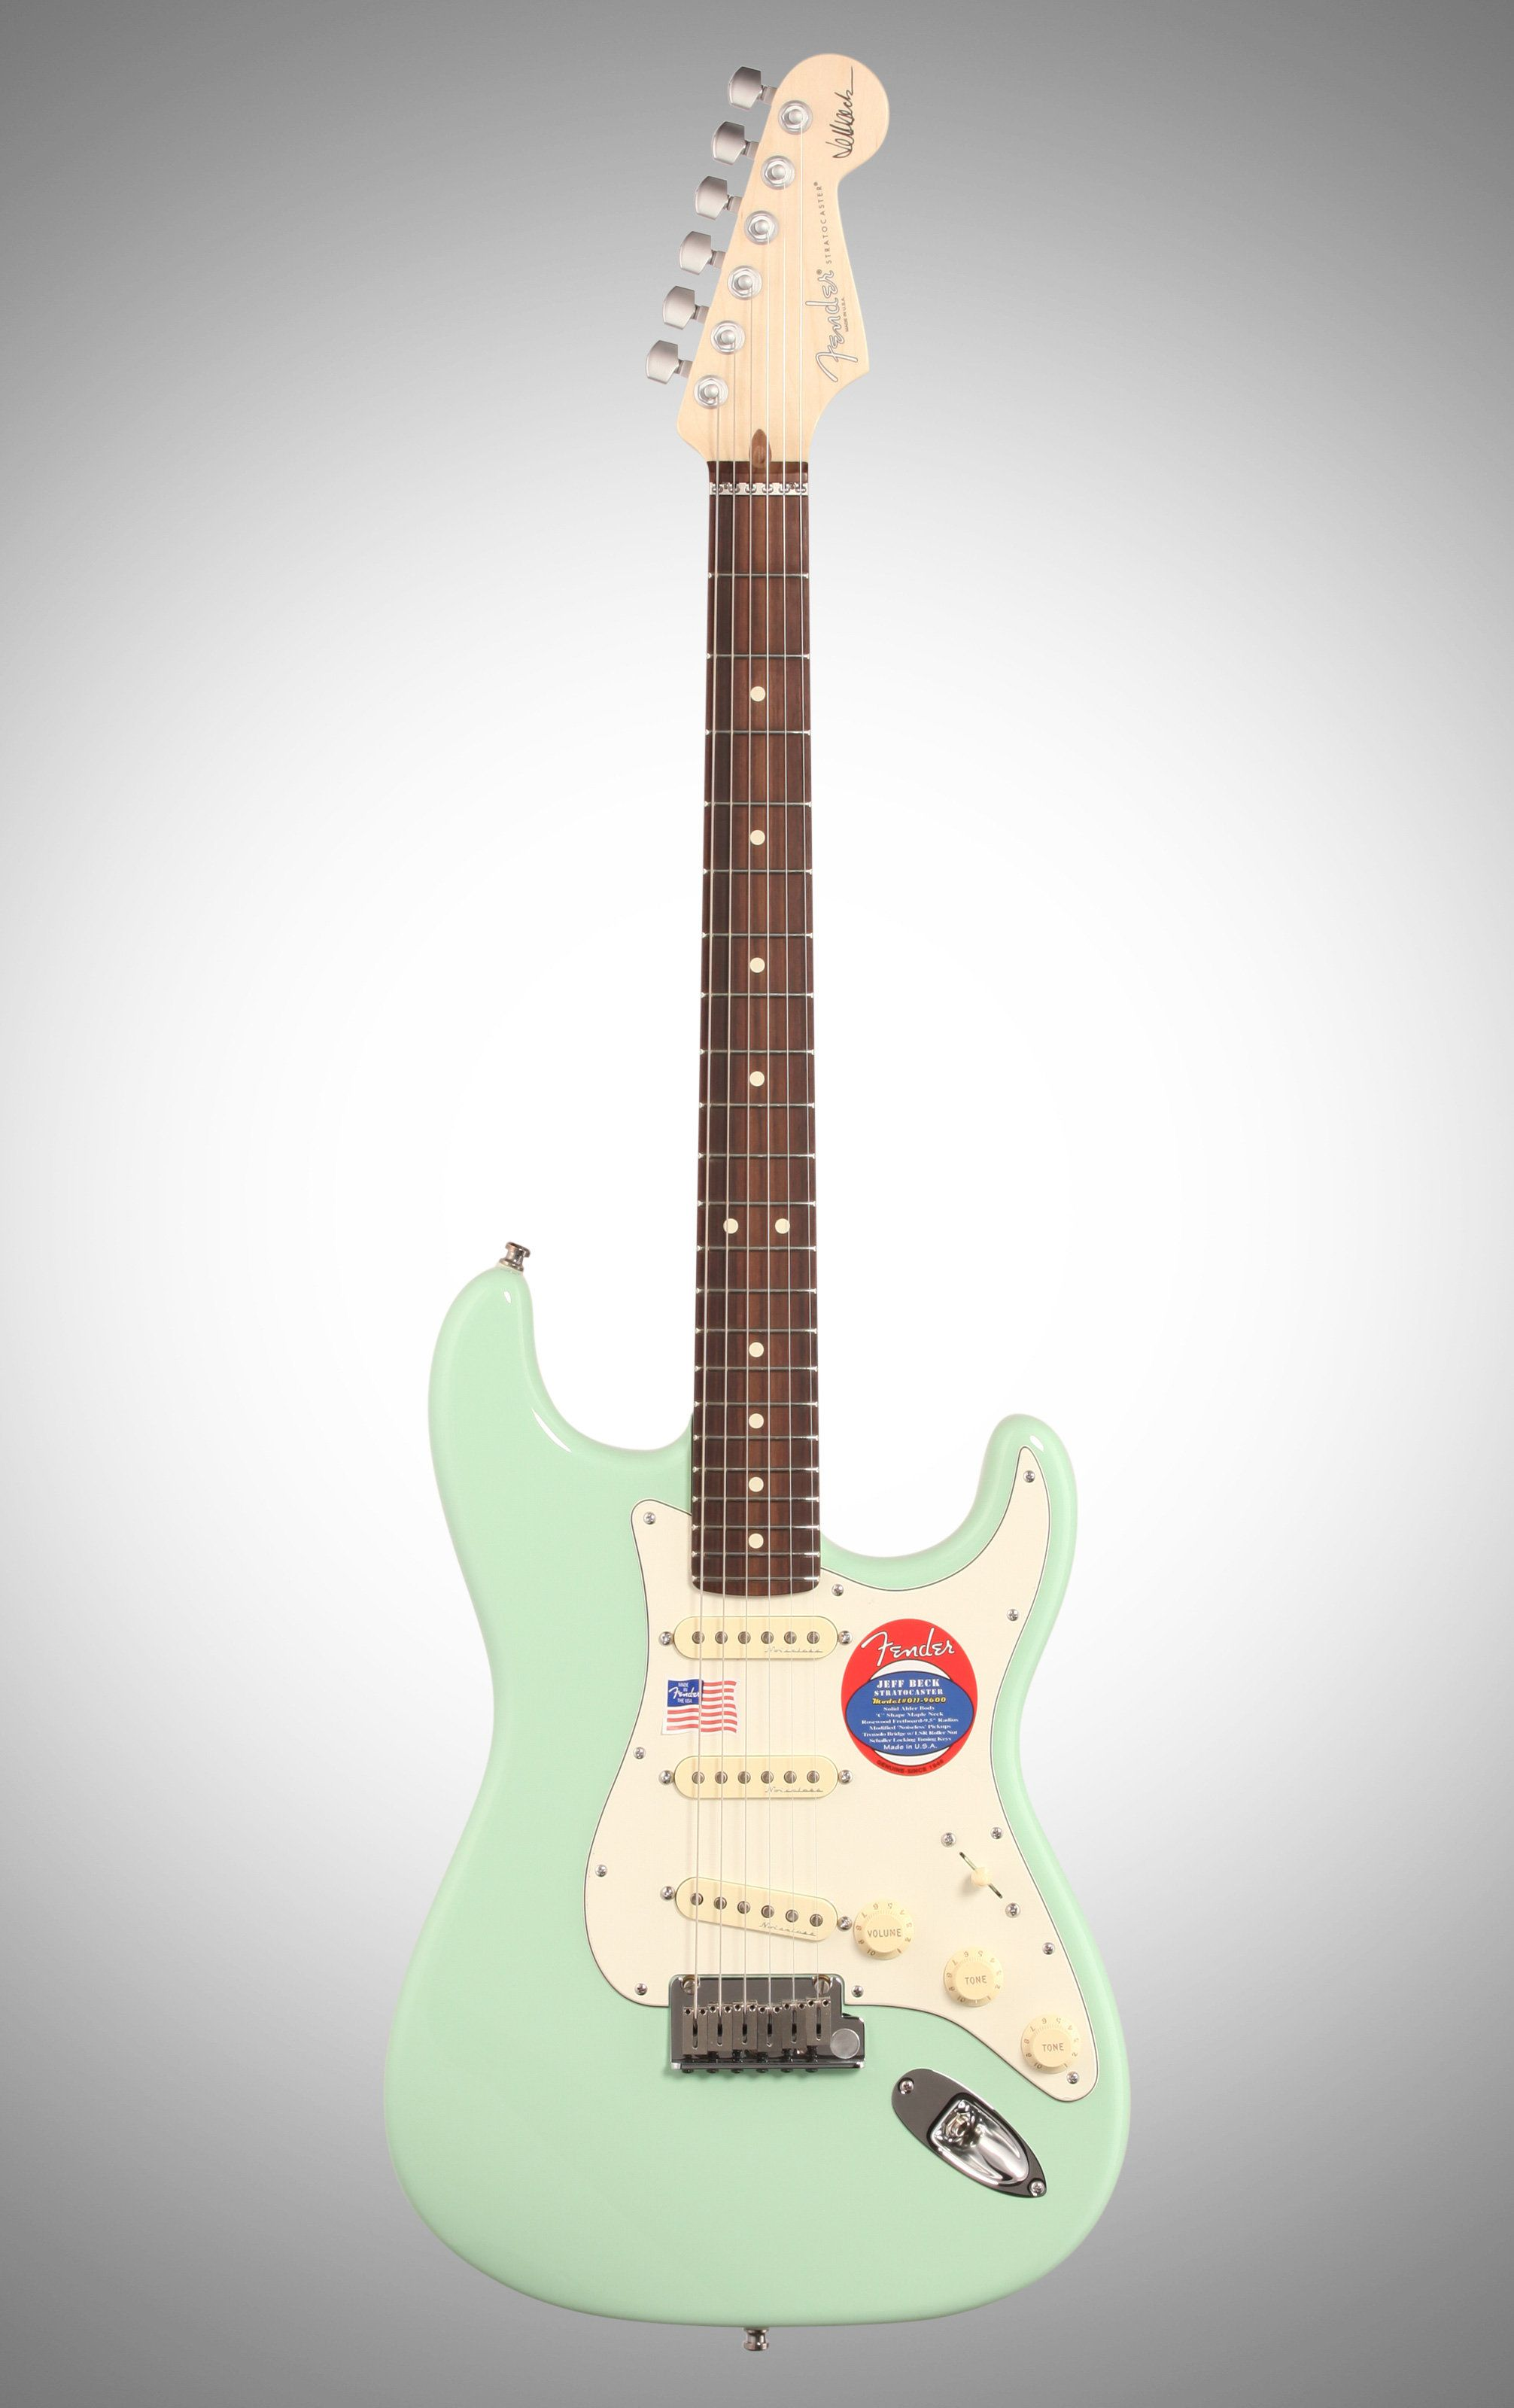 [SCHEMATICS_48EU]  Fender Jeff Beck Stratocaster Electric Guitar (with Case), Surf Green | Fender Jeff Beck Stratocaster Wiring Diagram |  | Pinterest